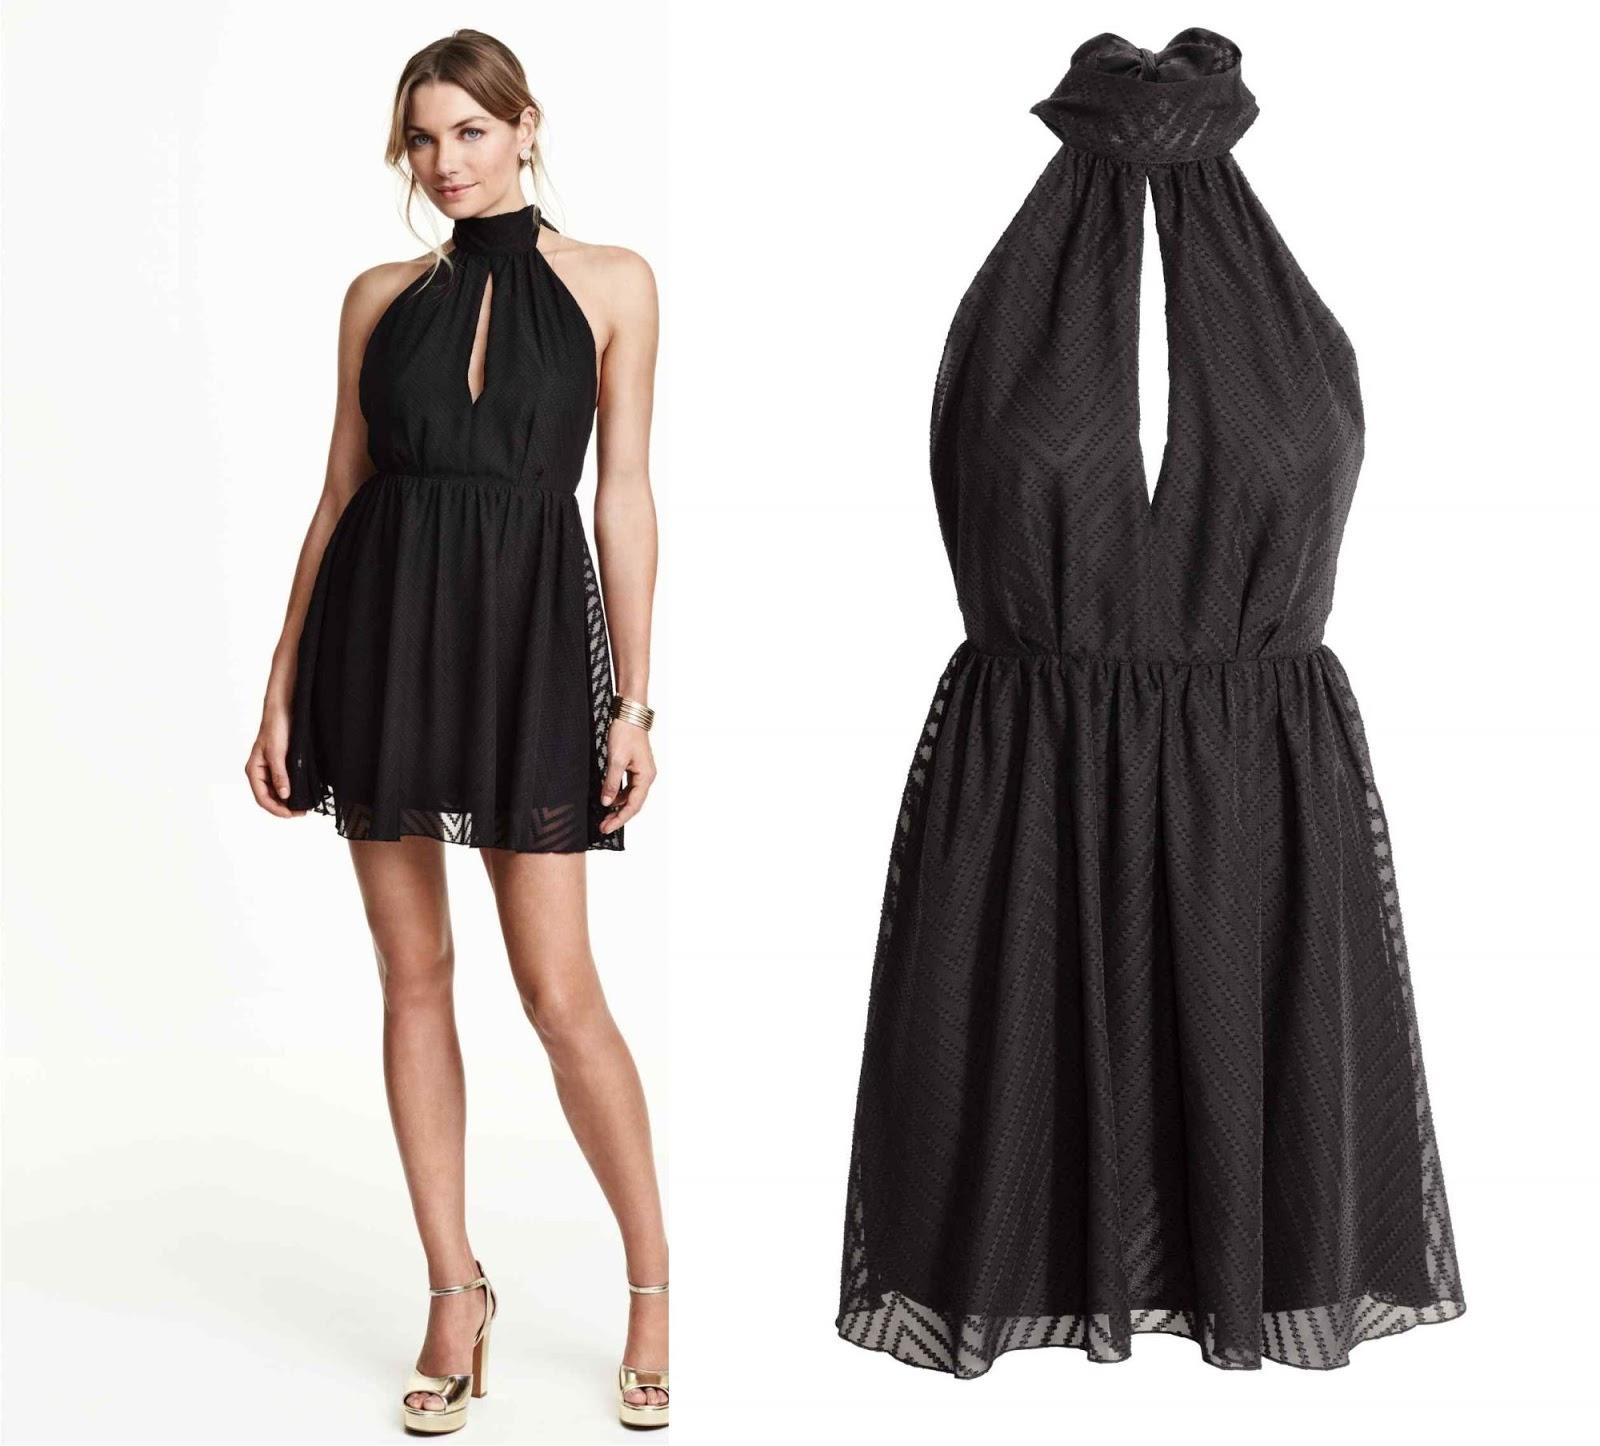 przeglad sukienek